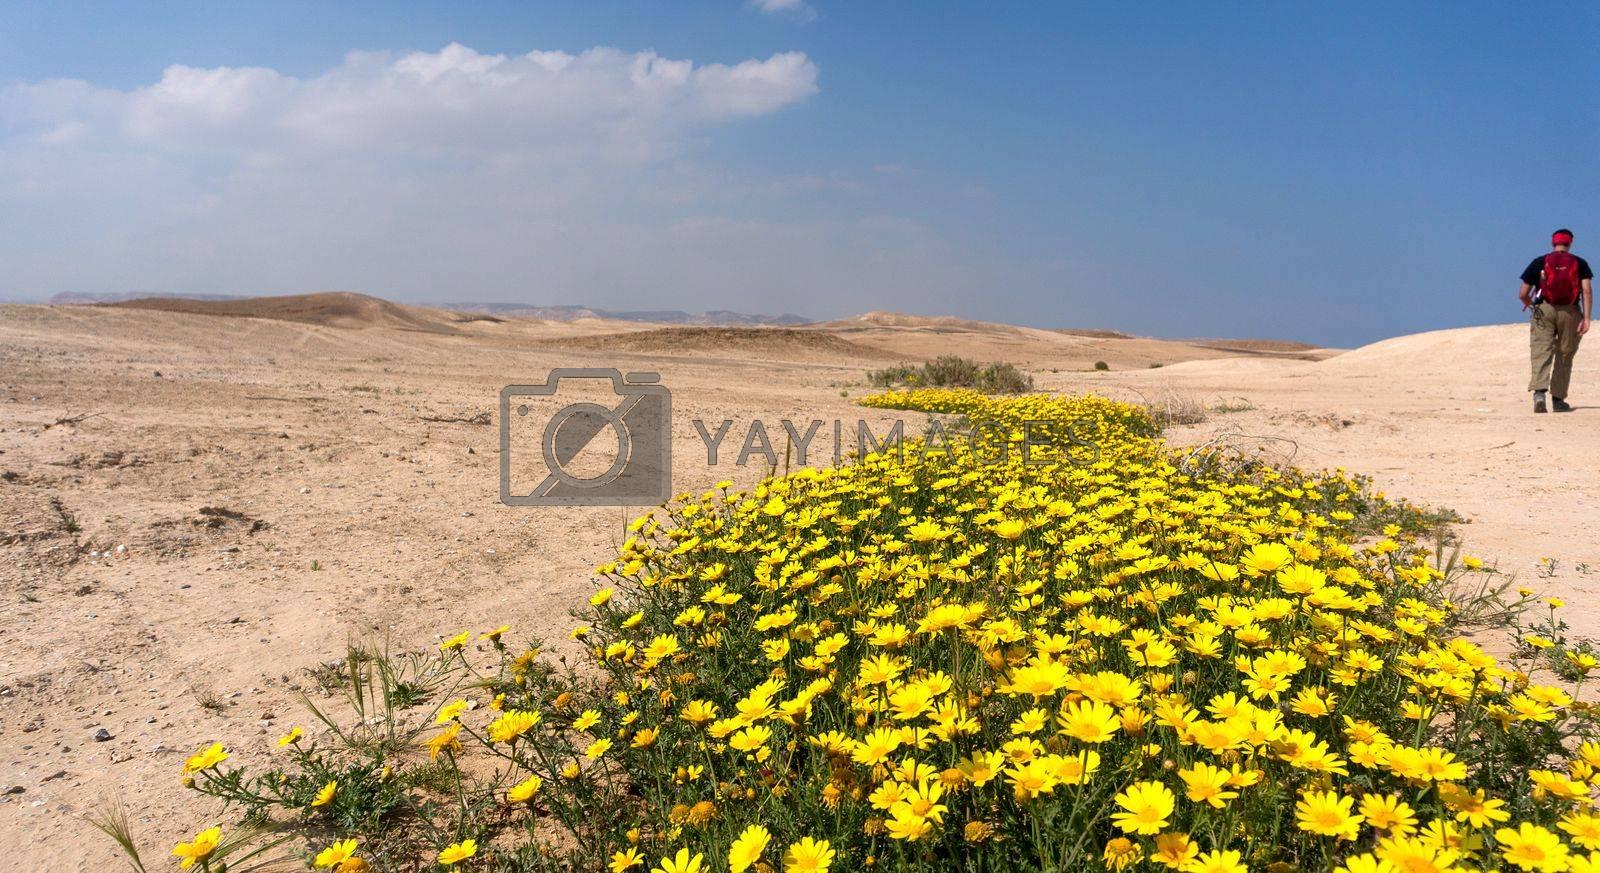 String in israeli negev desert by javax